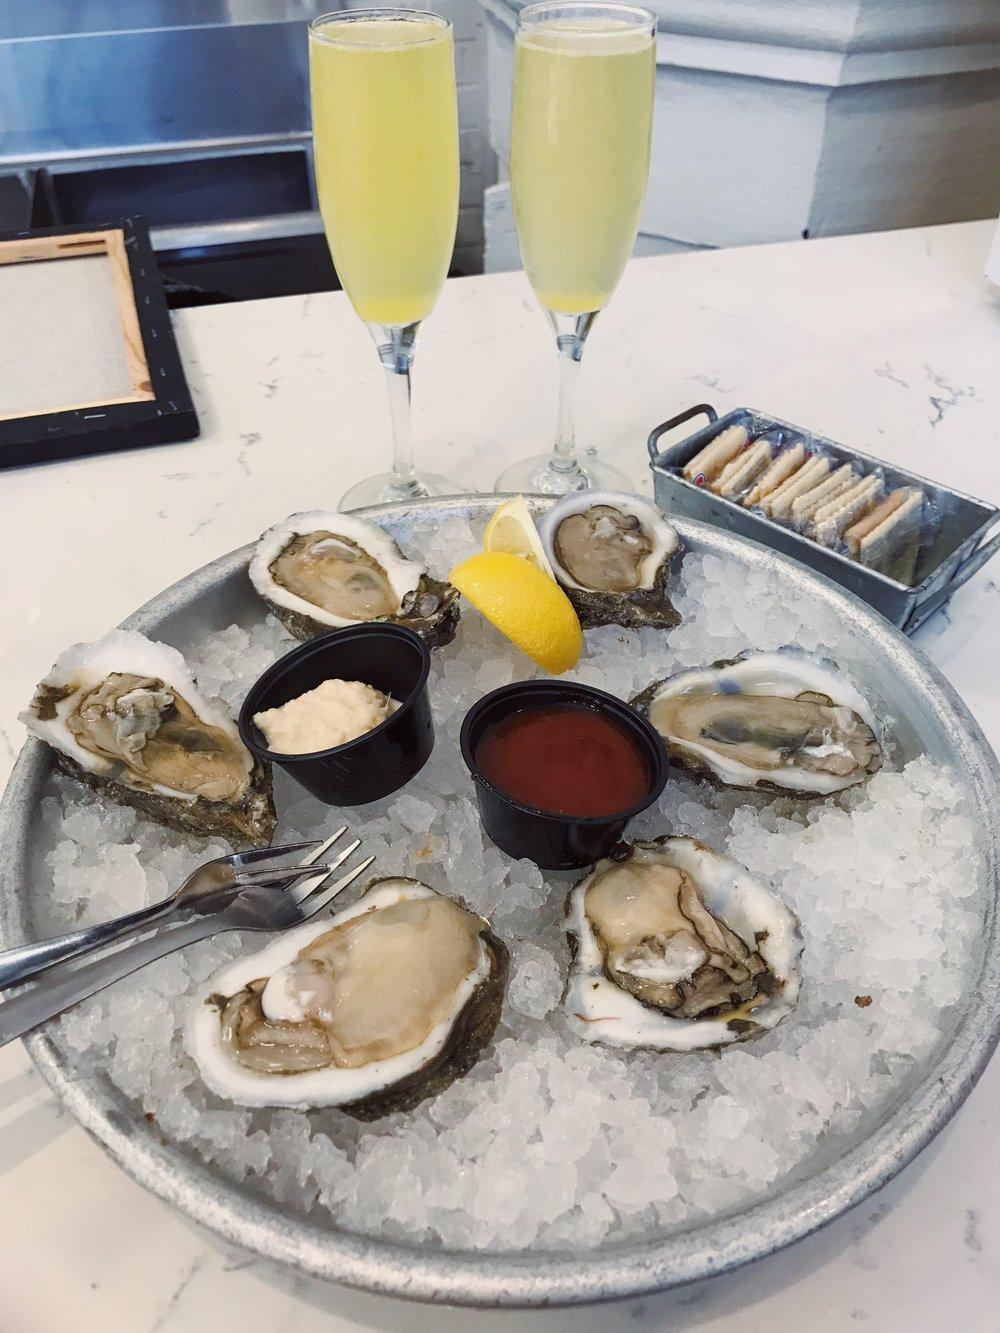 oysters-mimosas-st-roche-market-nola-lauren-schwaiger-travel-blog.jpg